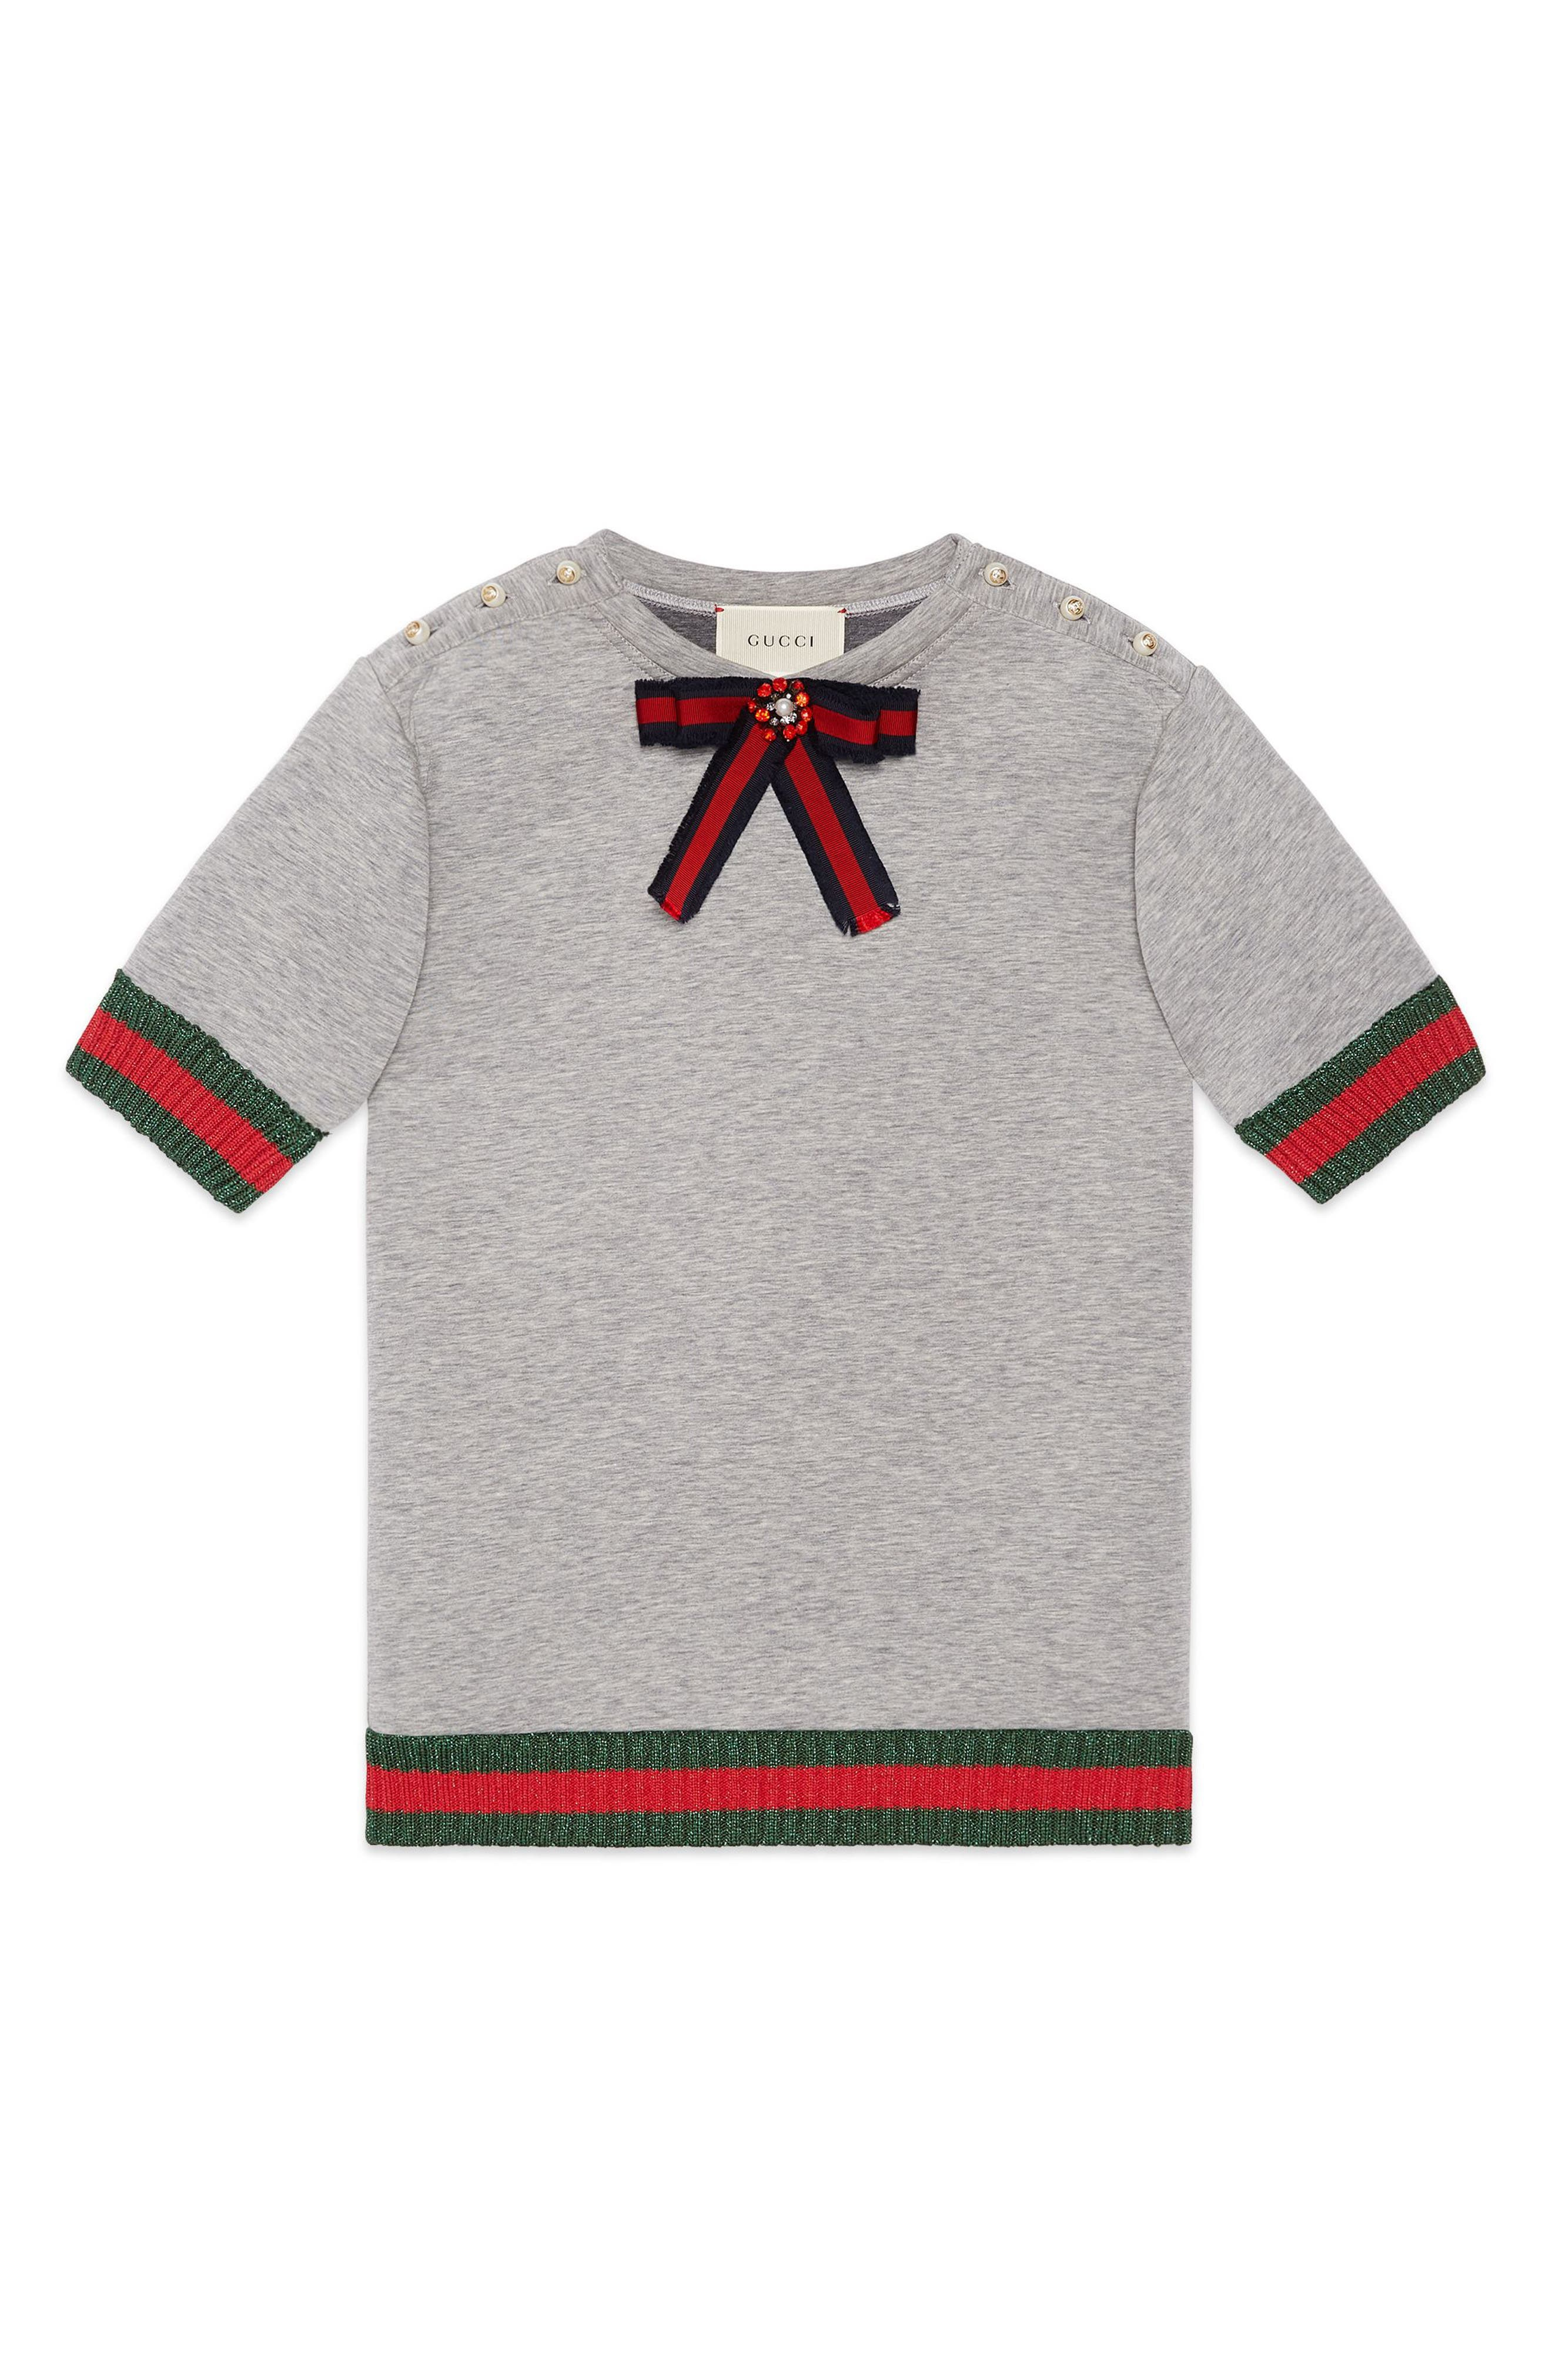 Gucci Bow Sweater (Little Girls & Big Girls)